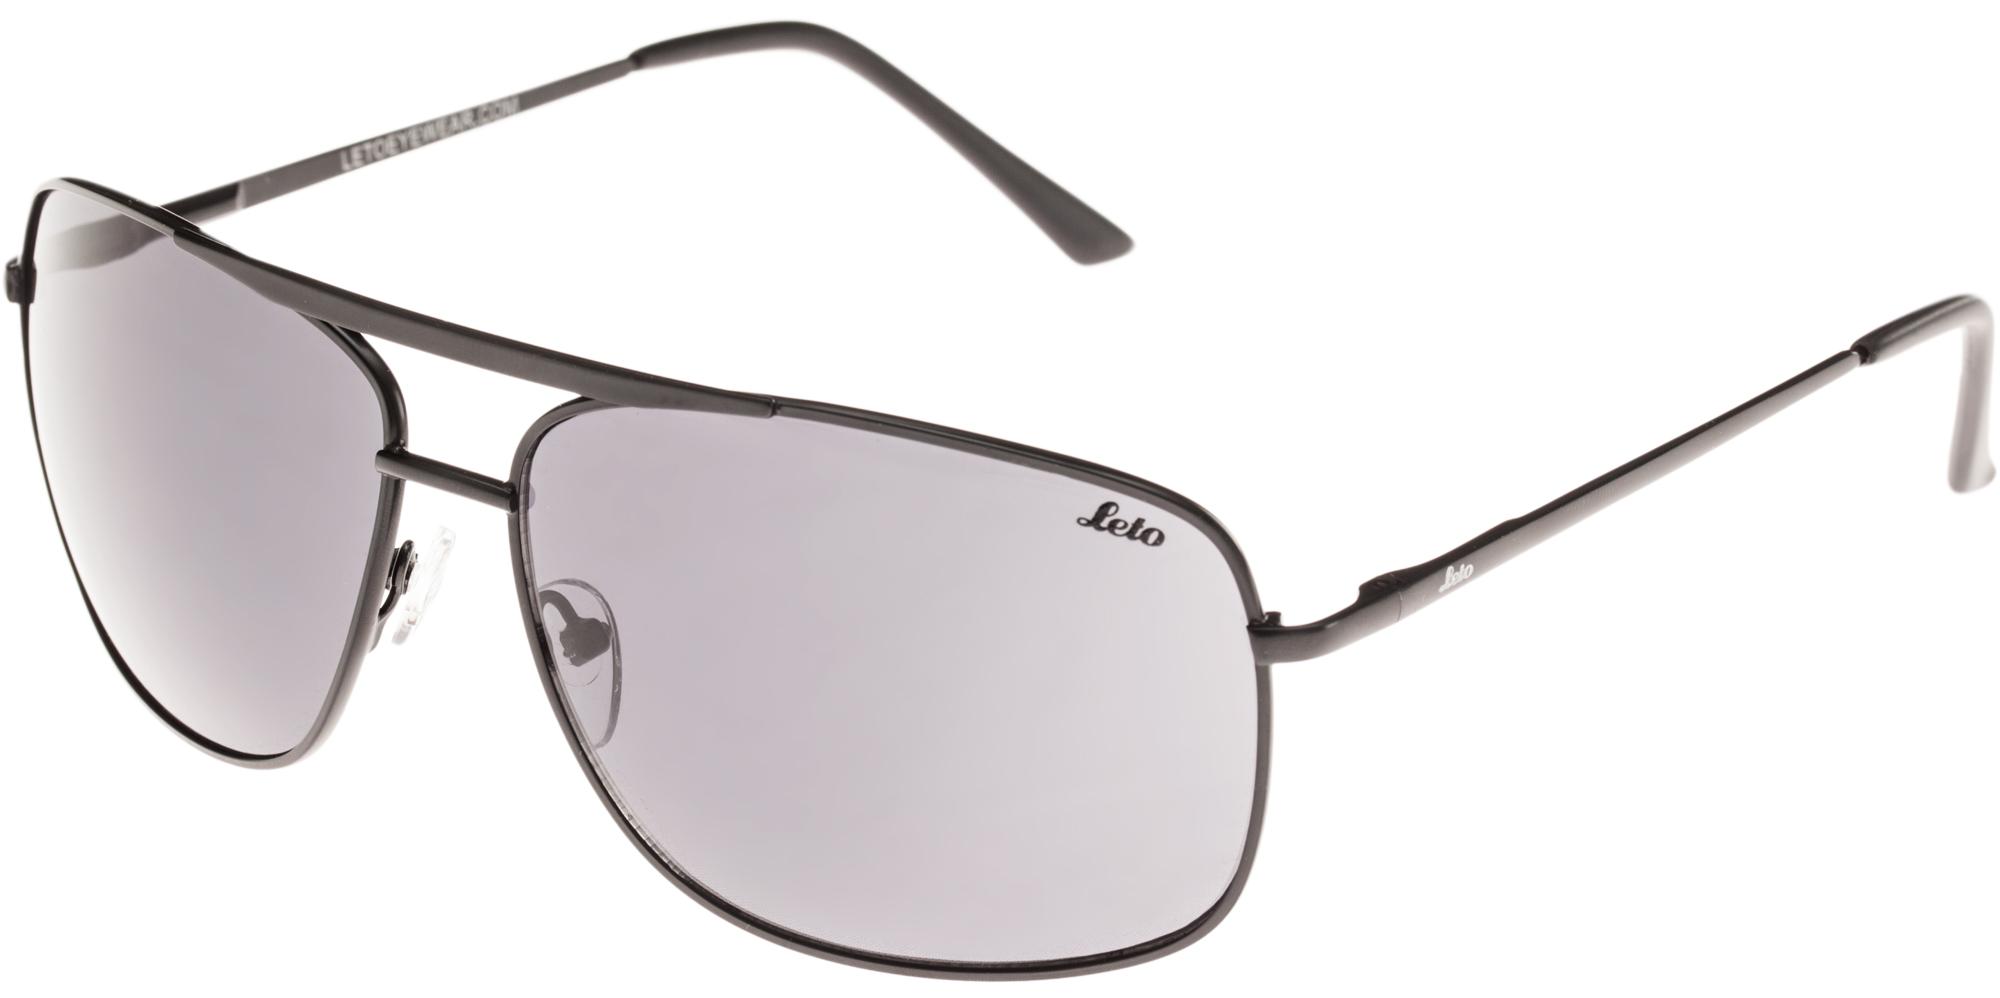 Leto Солнцезащитные очки мужские Leto солнцезащитные мужские очки уфа